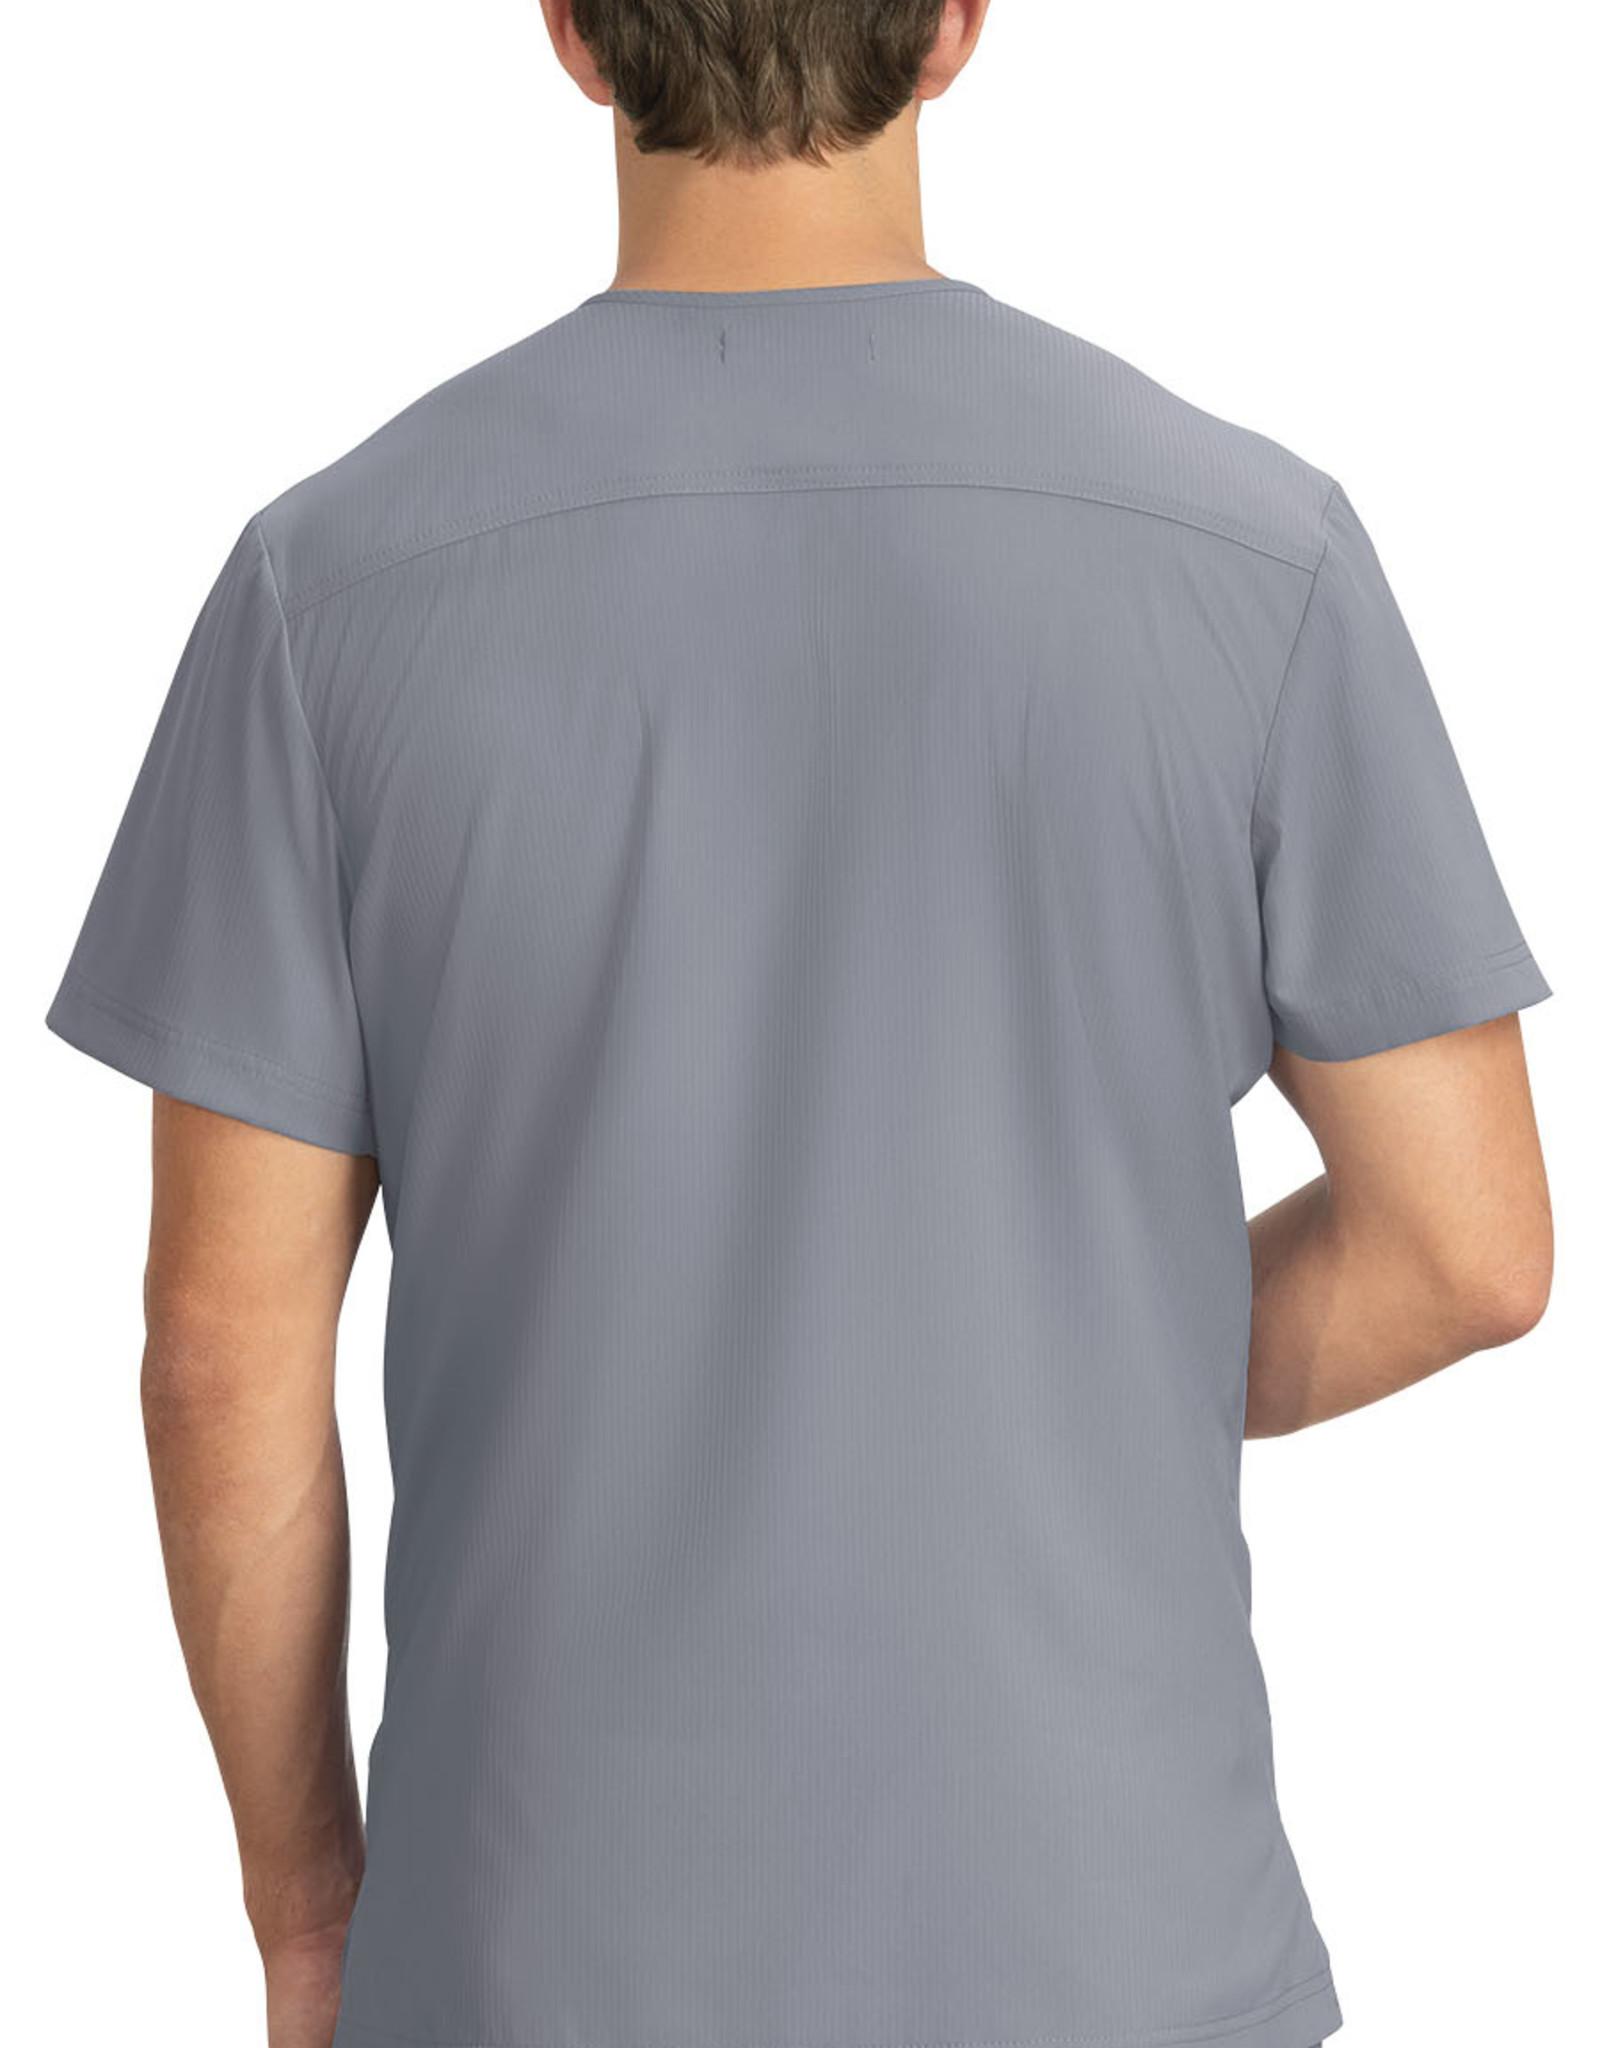 Koi 667 Force Men's Top Platnium Grey